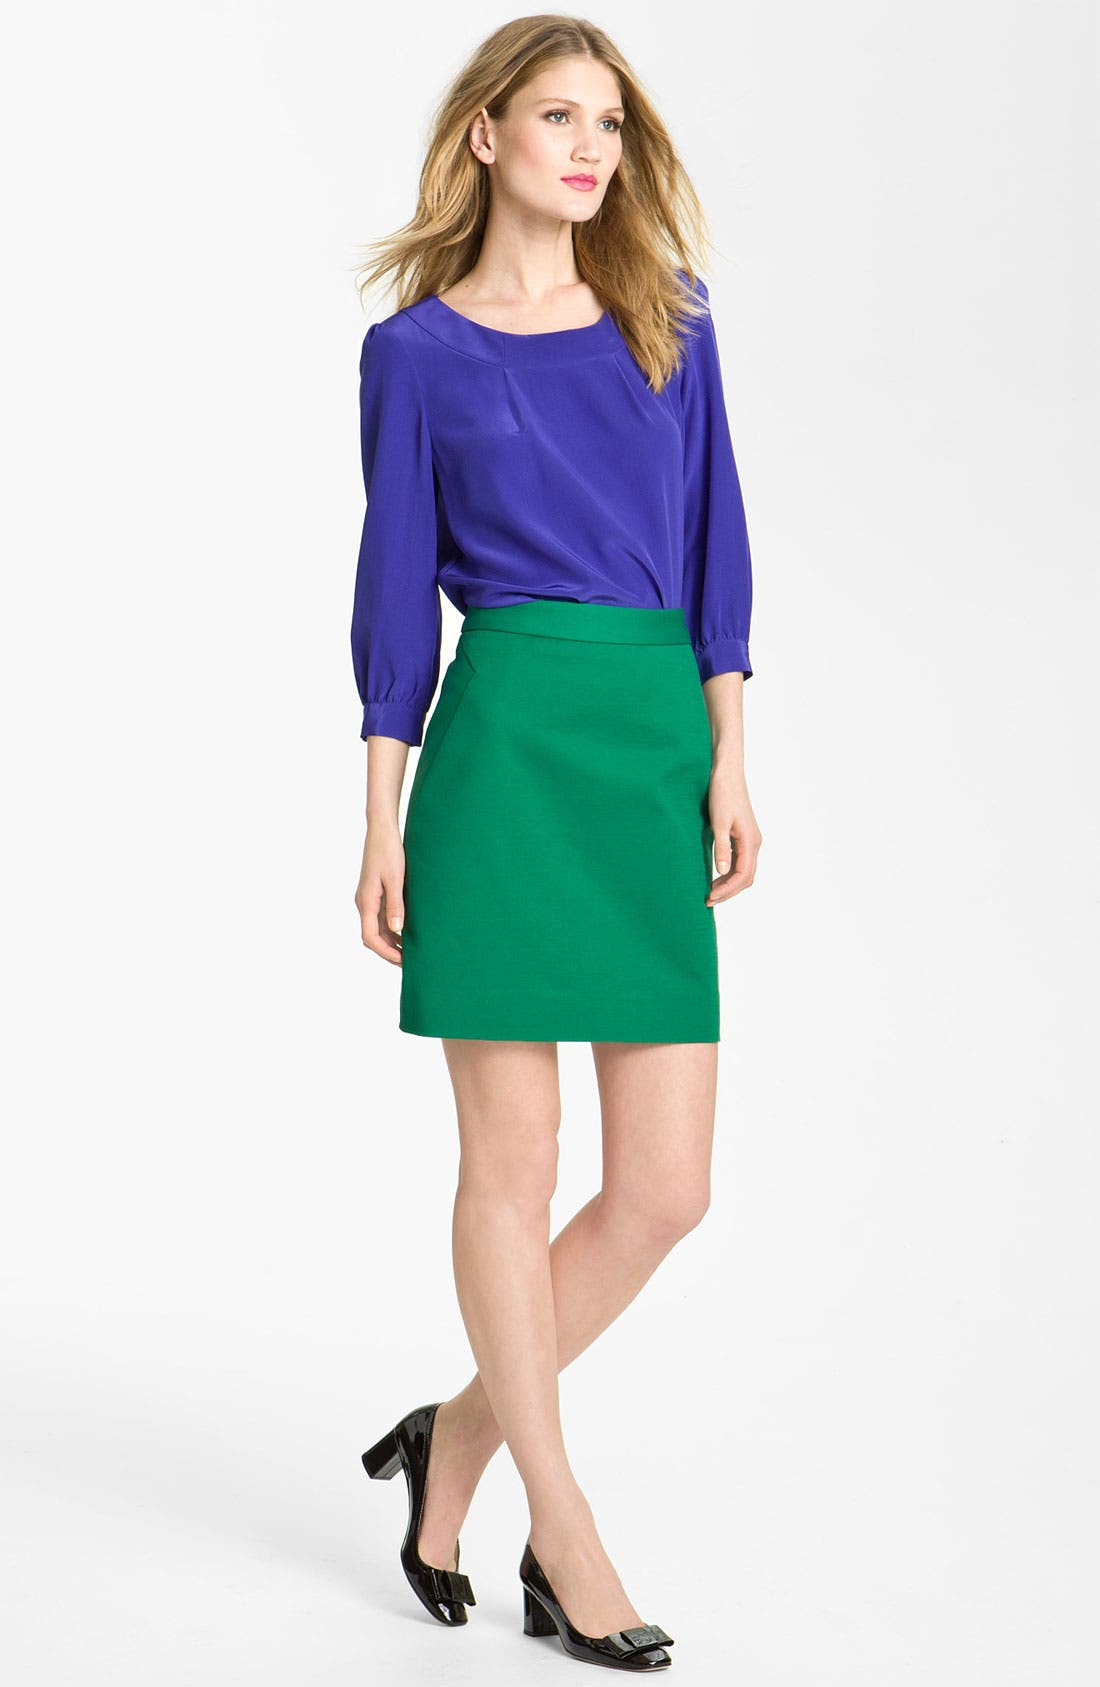 Main Image - kate spade new york 'bridgette' blouse